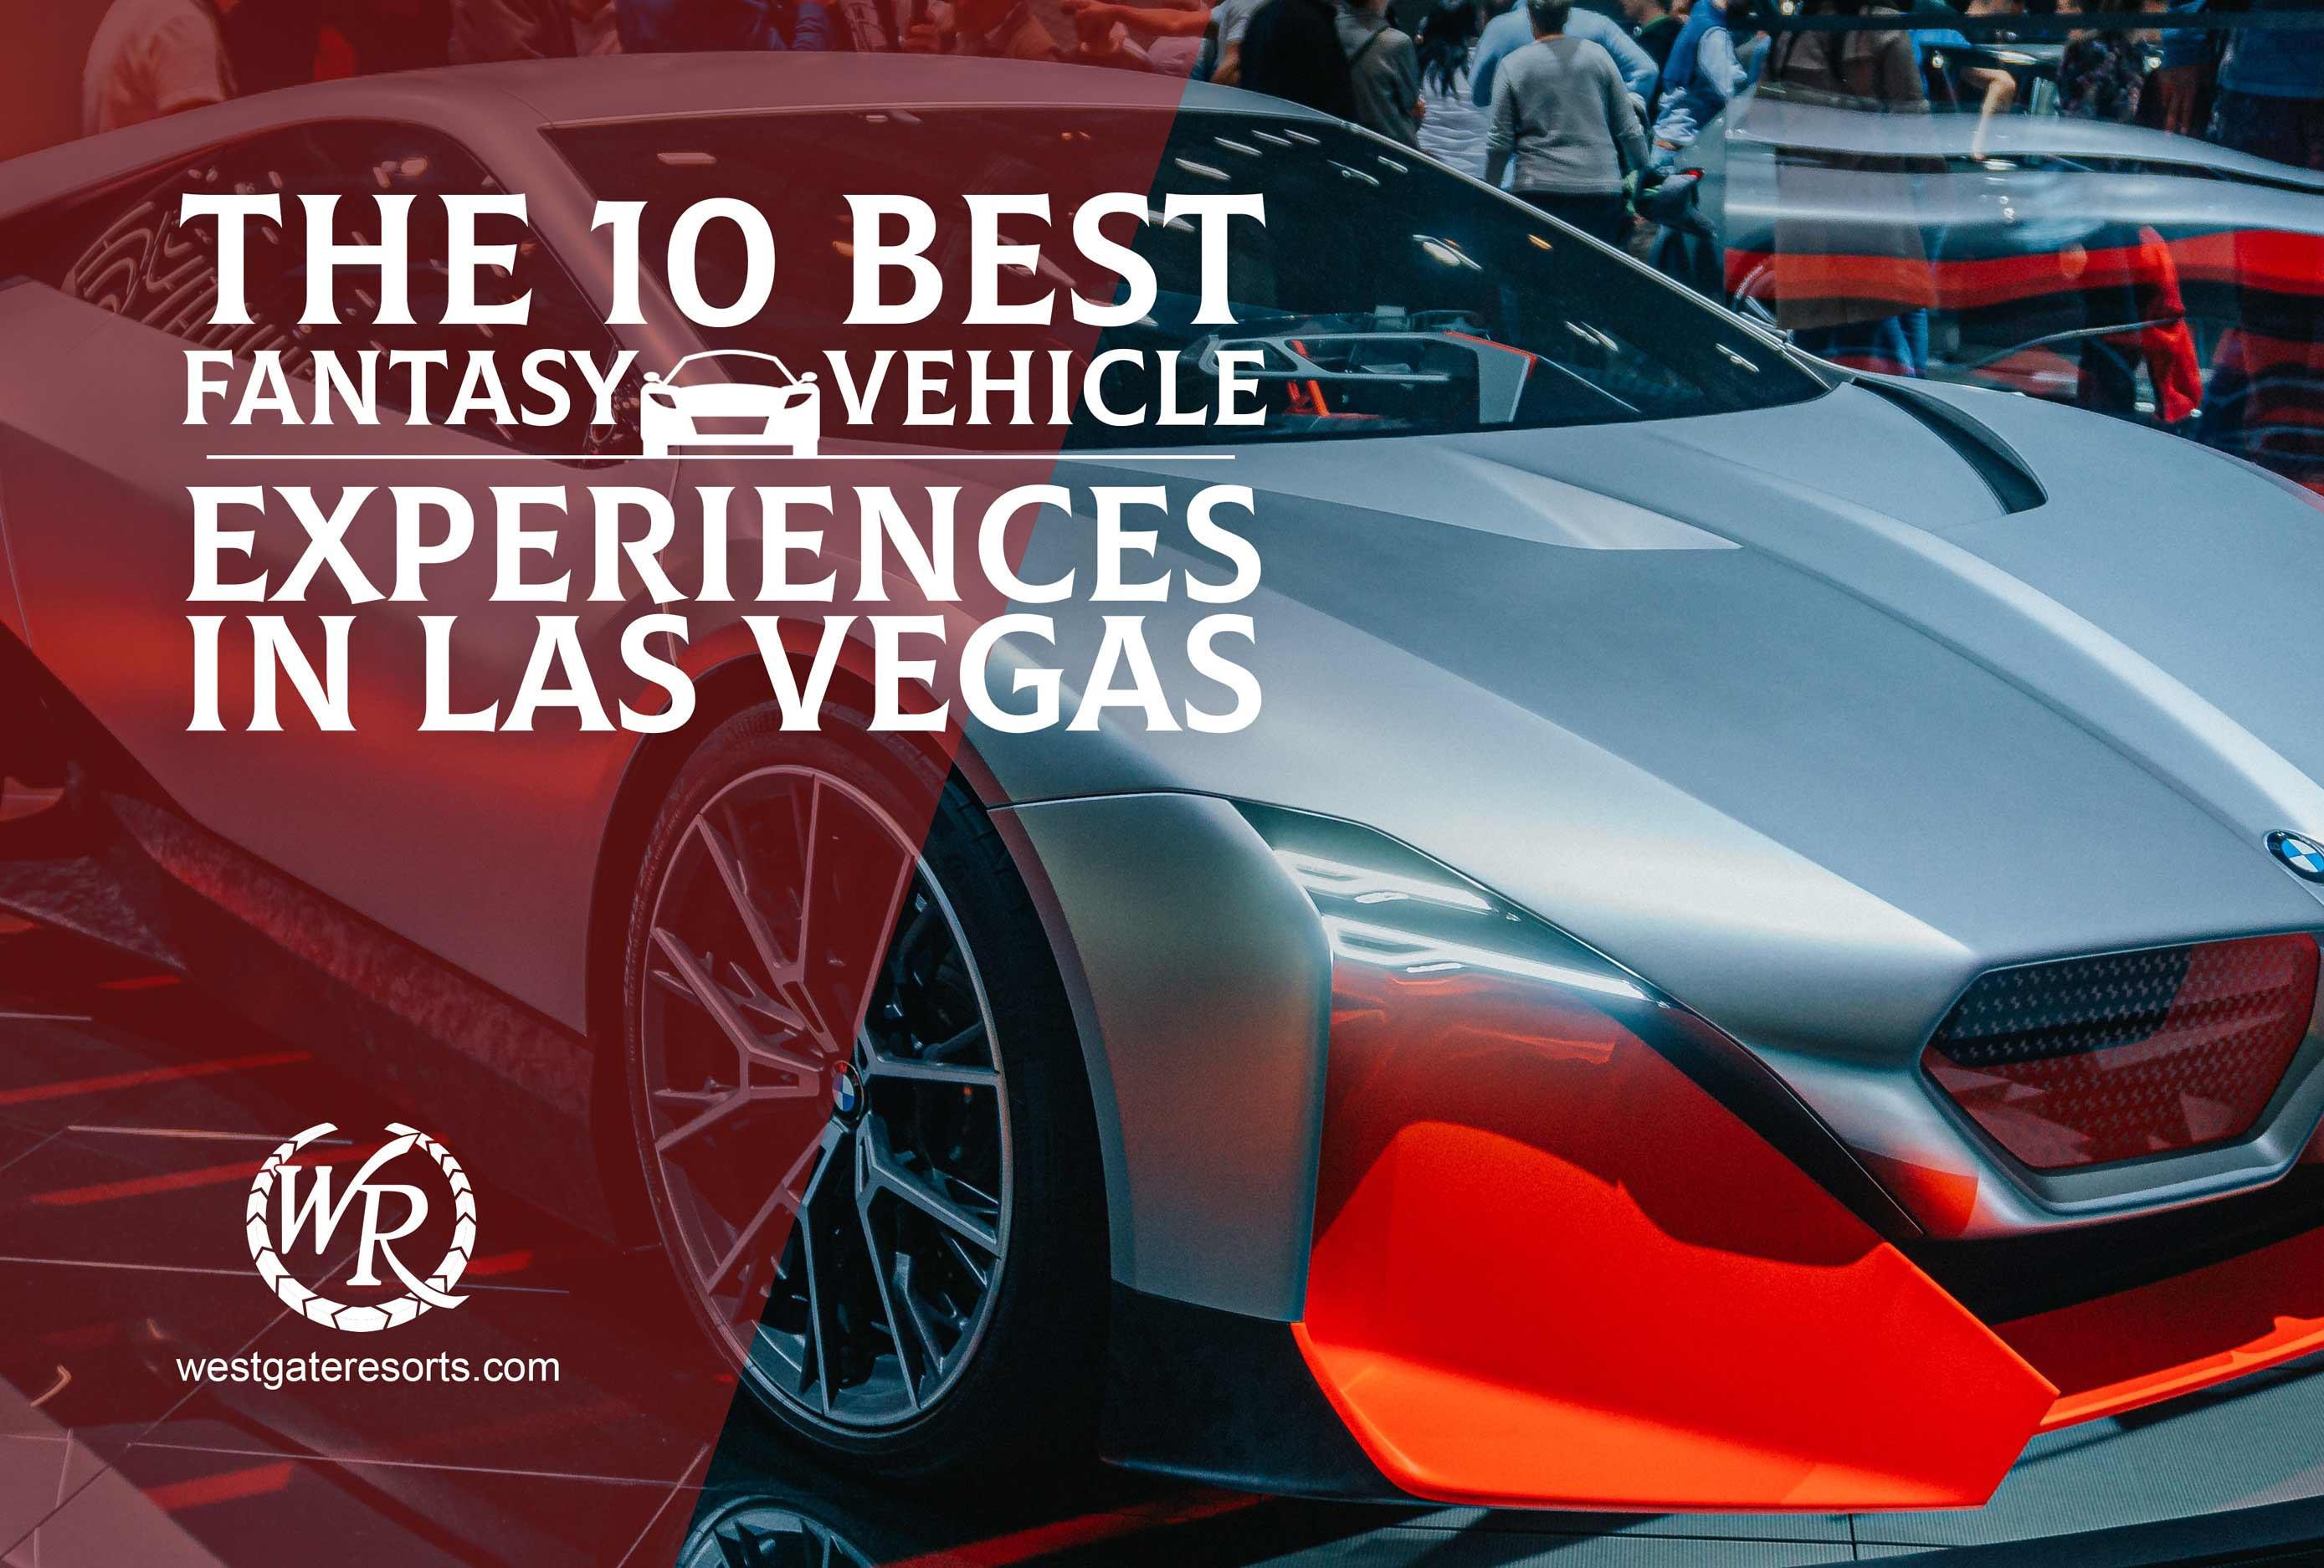 The Top 10 Fantasy Vehicle Driving Experiences in Las Vegas   Exotic Cars & Racing In Las Vegas